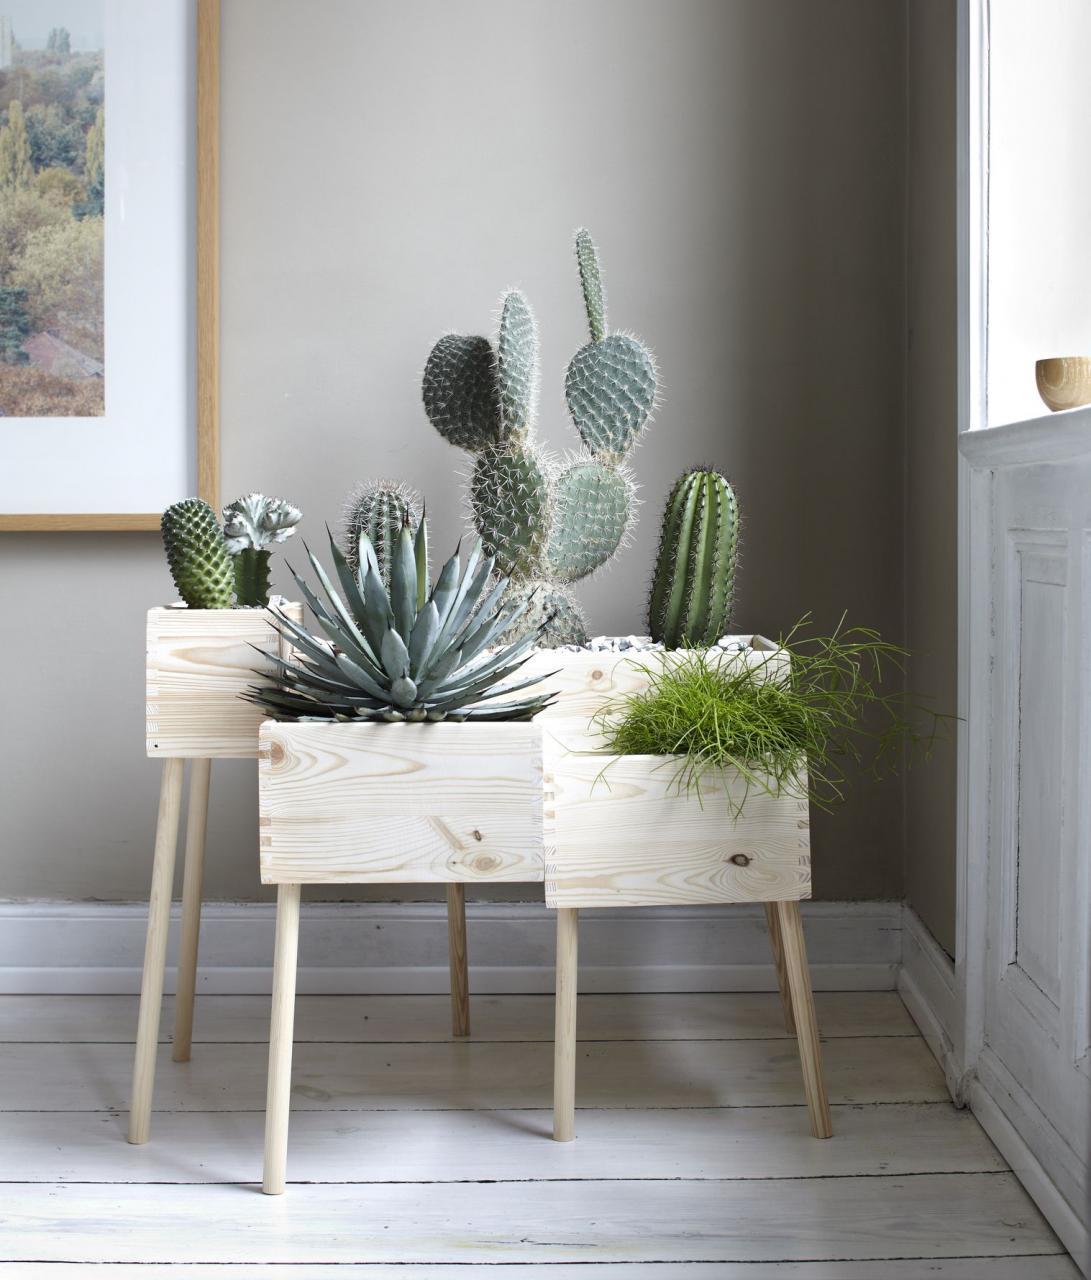 Cactus plants in room